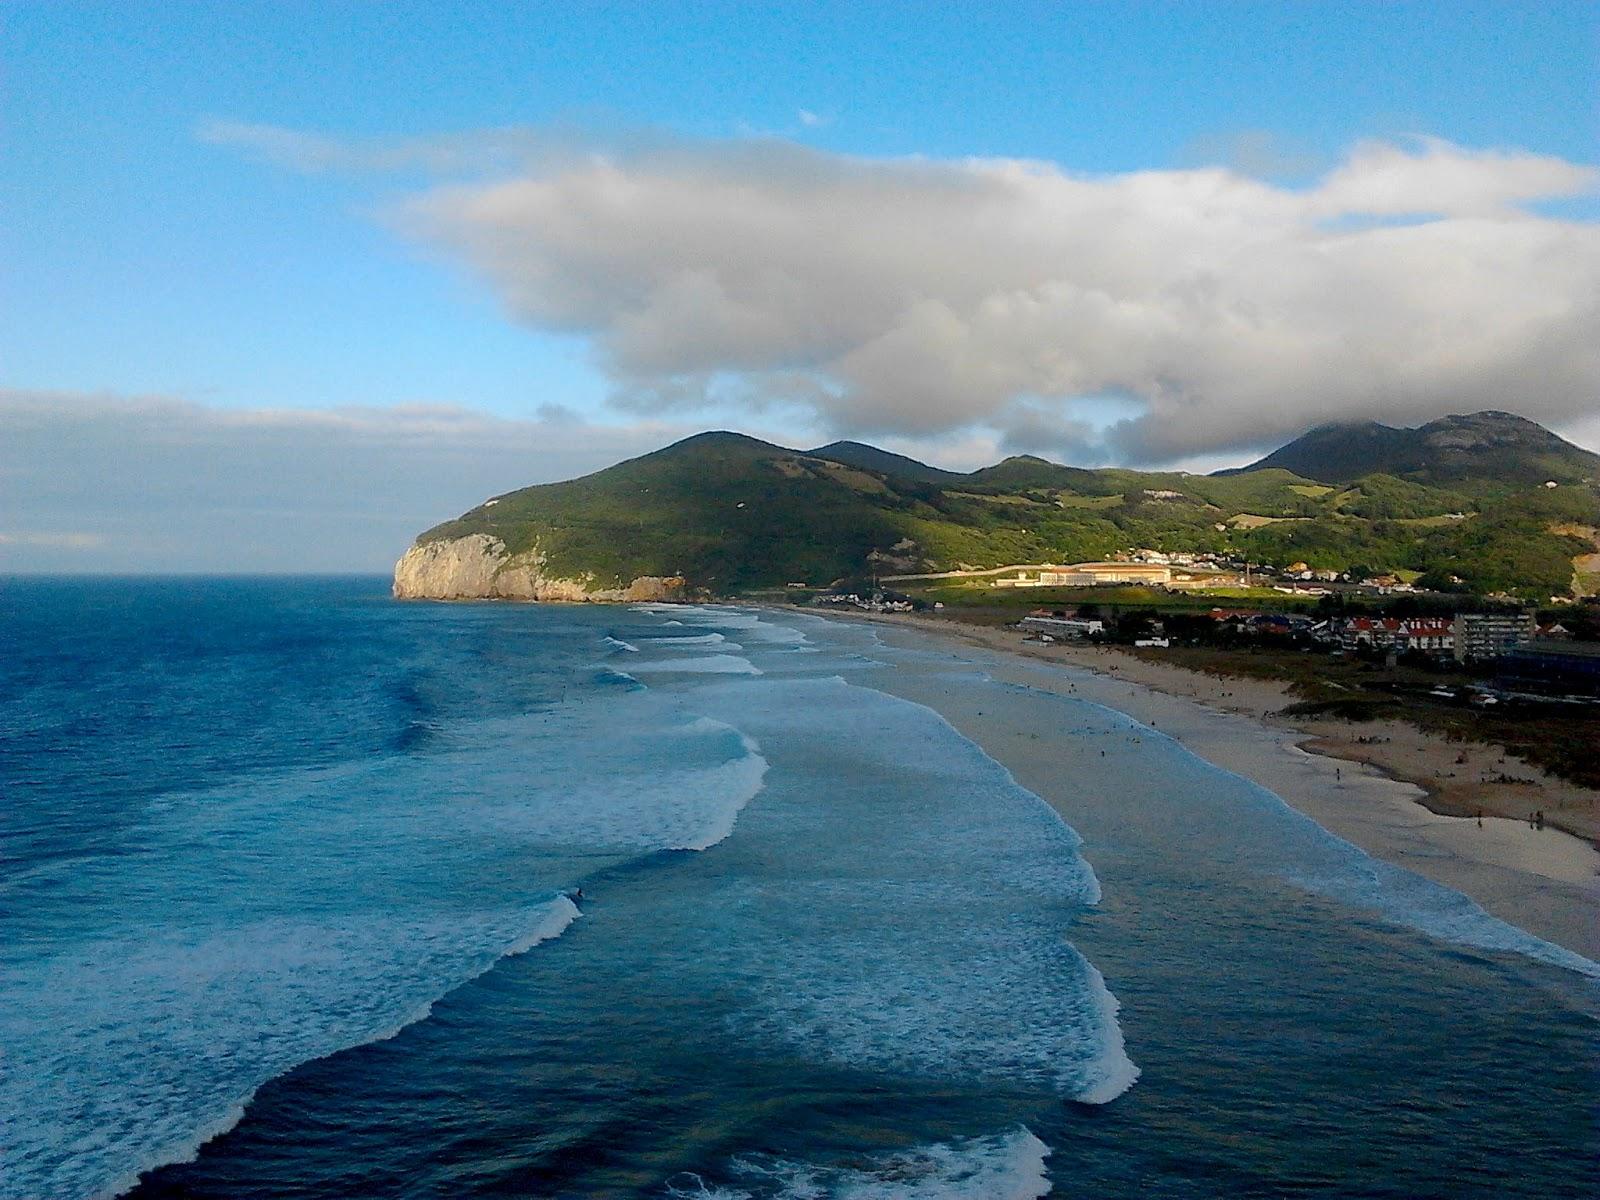 las mejores playas de cantabria, cantabria, las mejores playas, playas, best beachs, españa, spain, tourism, turismo, takemysecrets